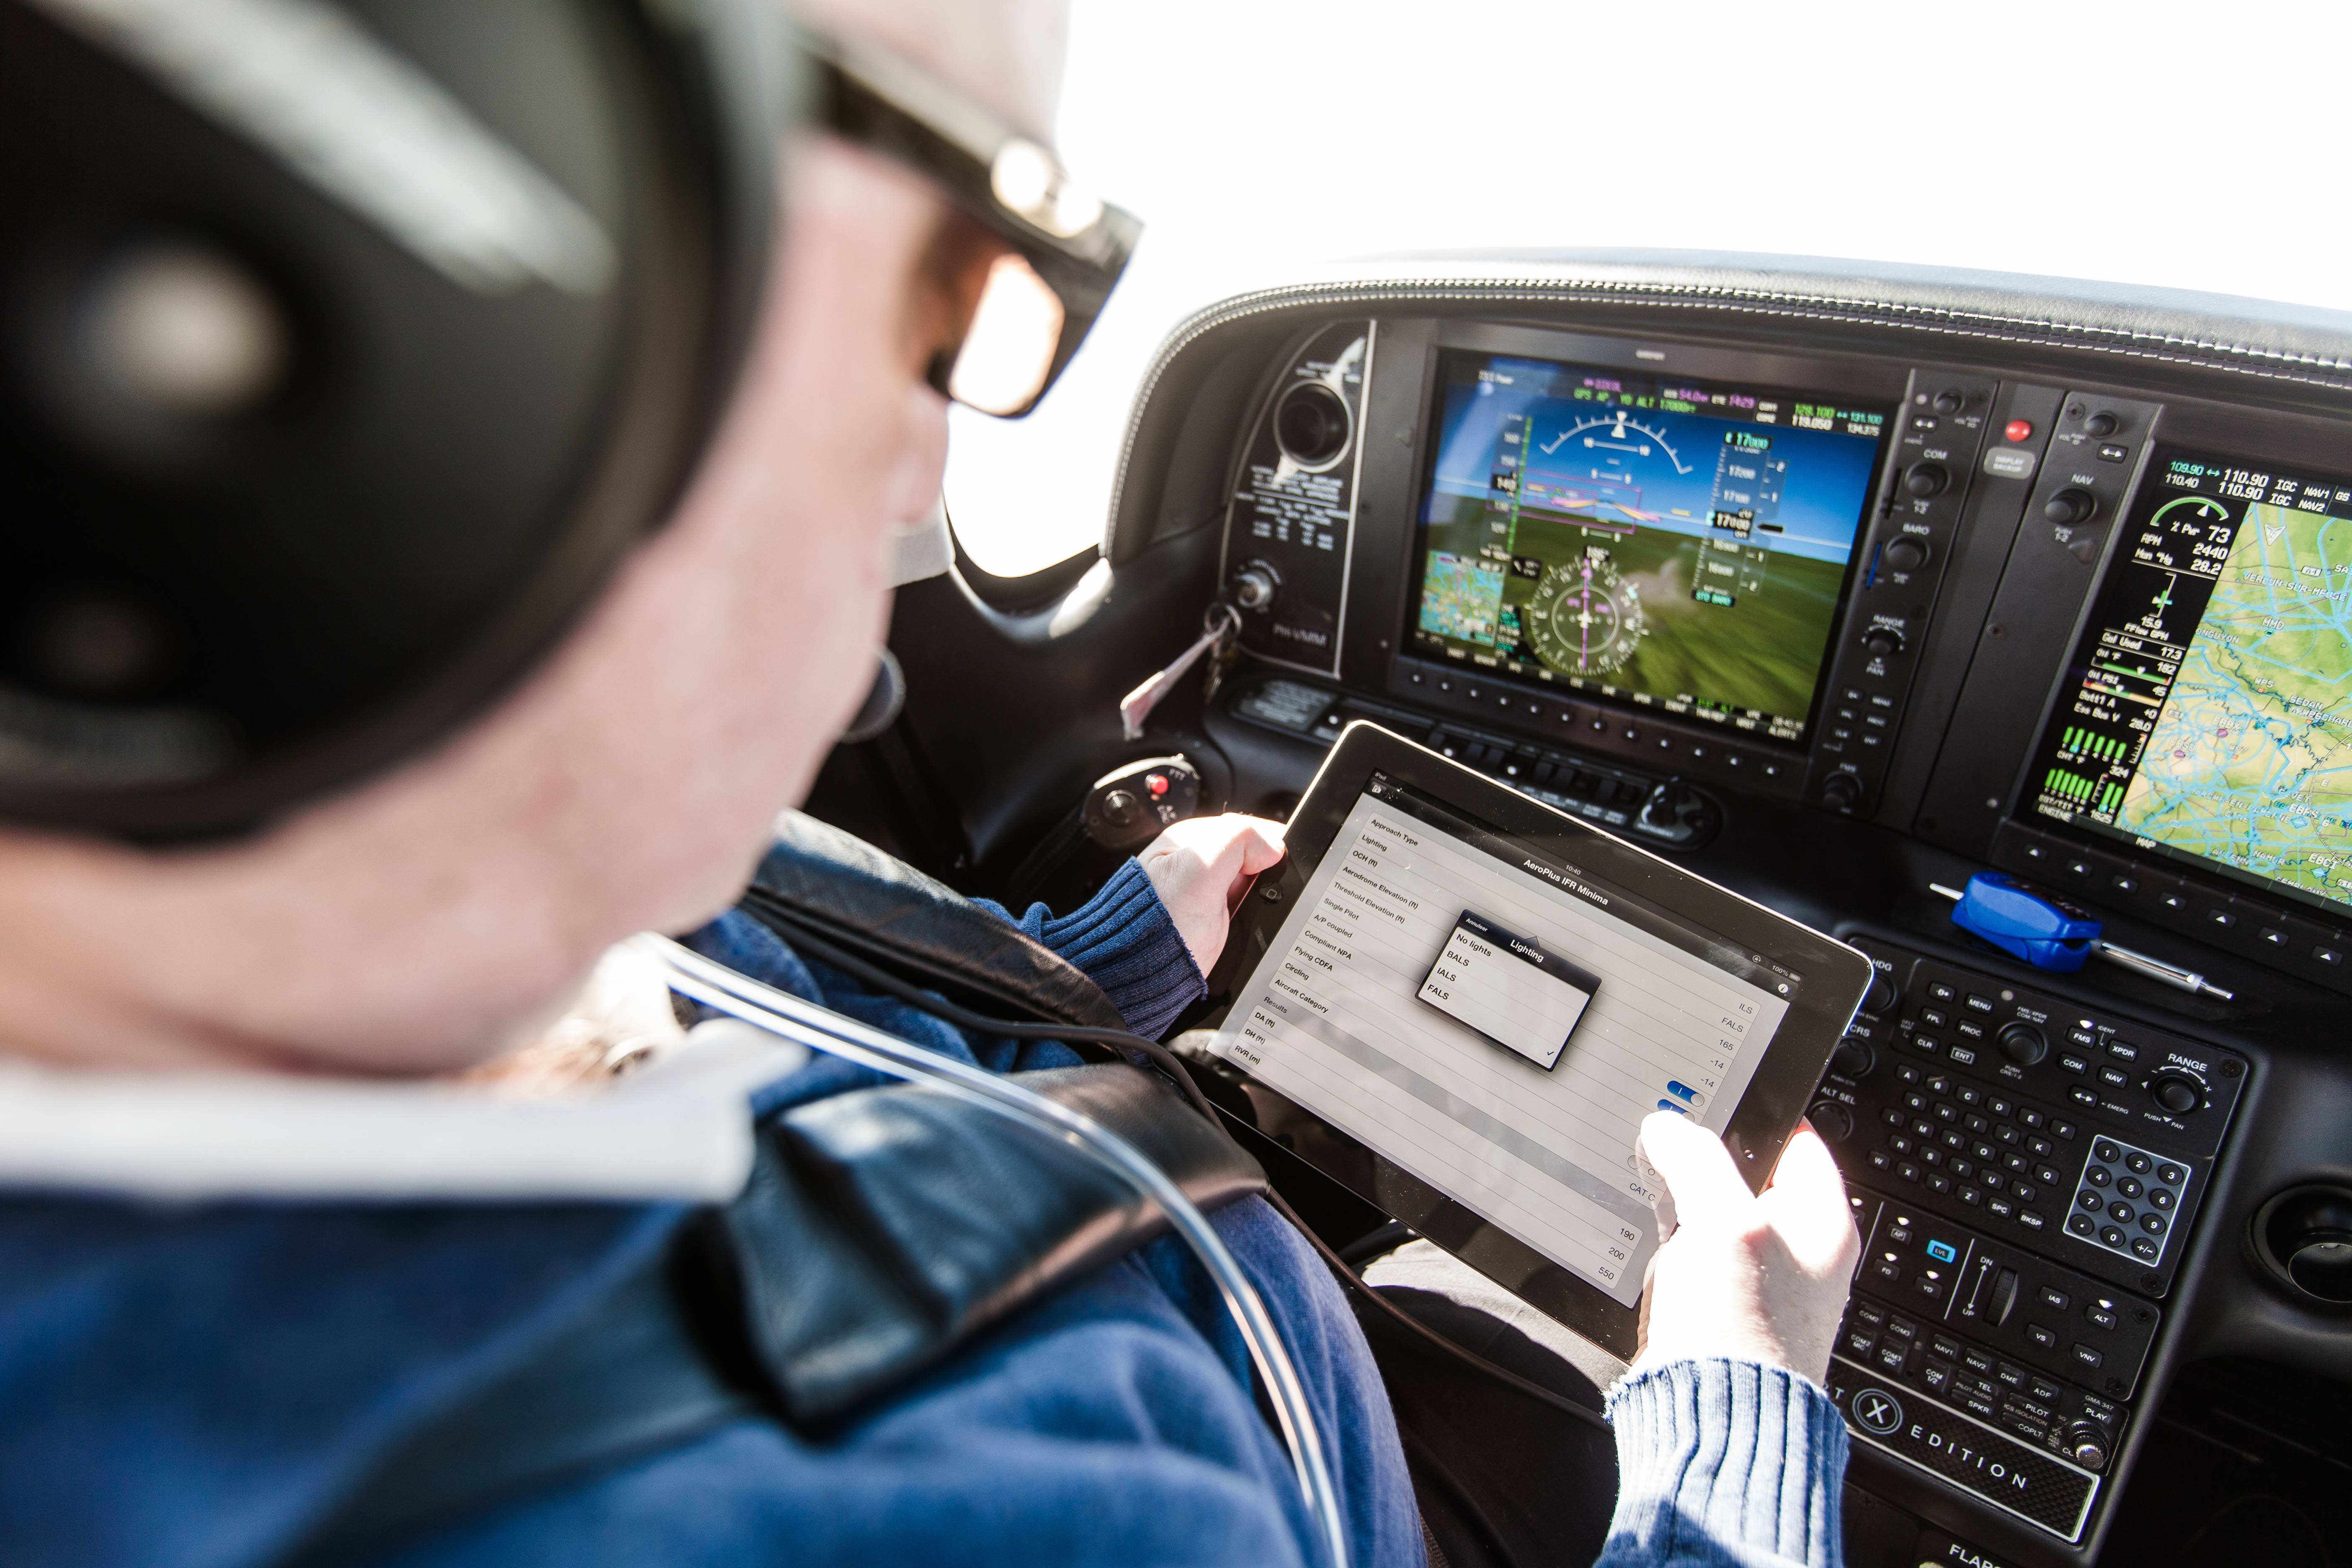 AeroPlus Flightplan app integrates with SkyDemon -